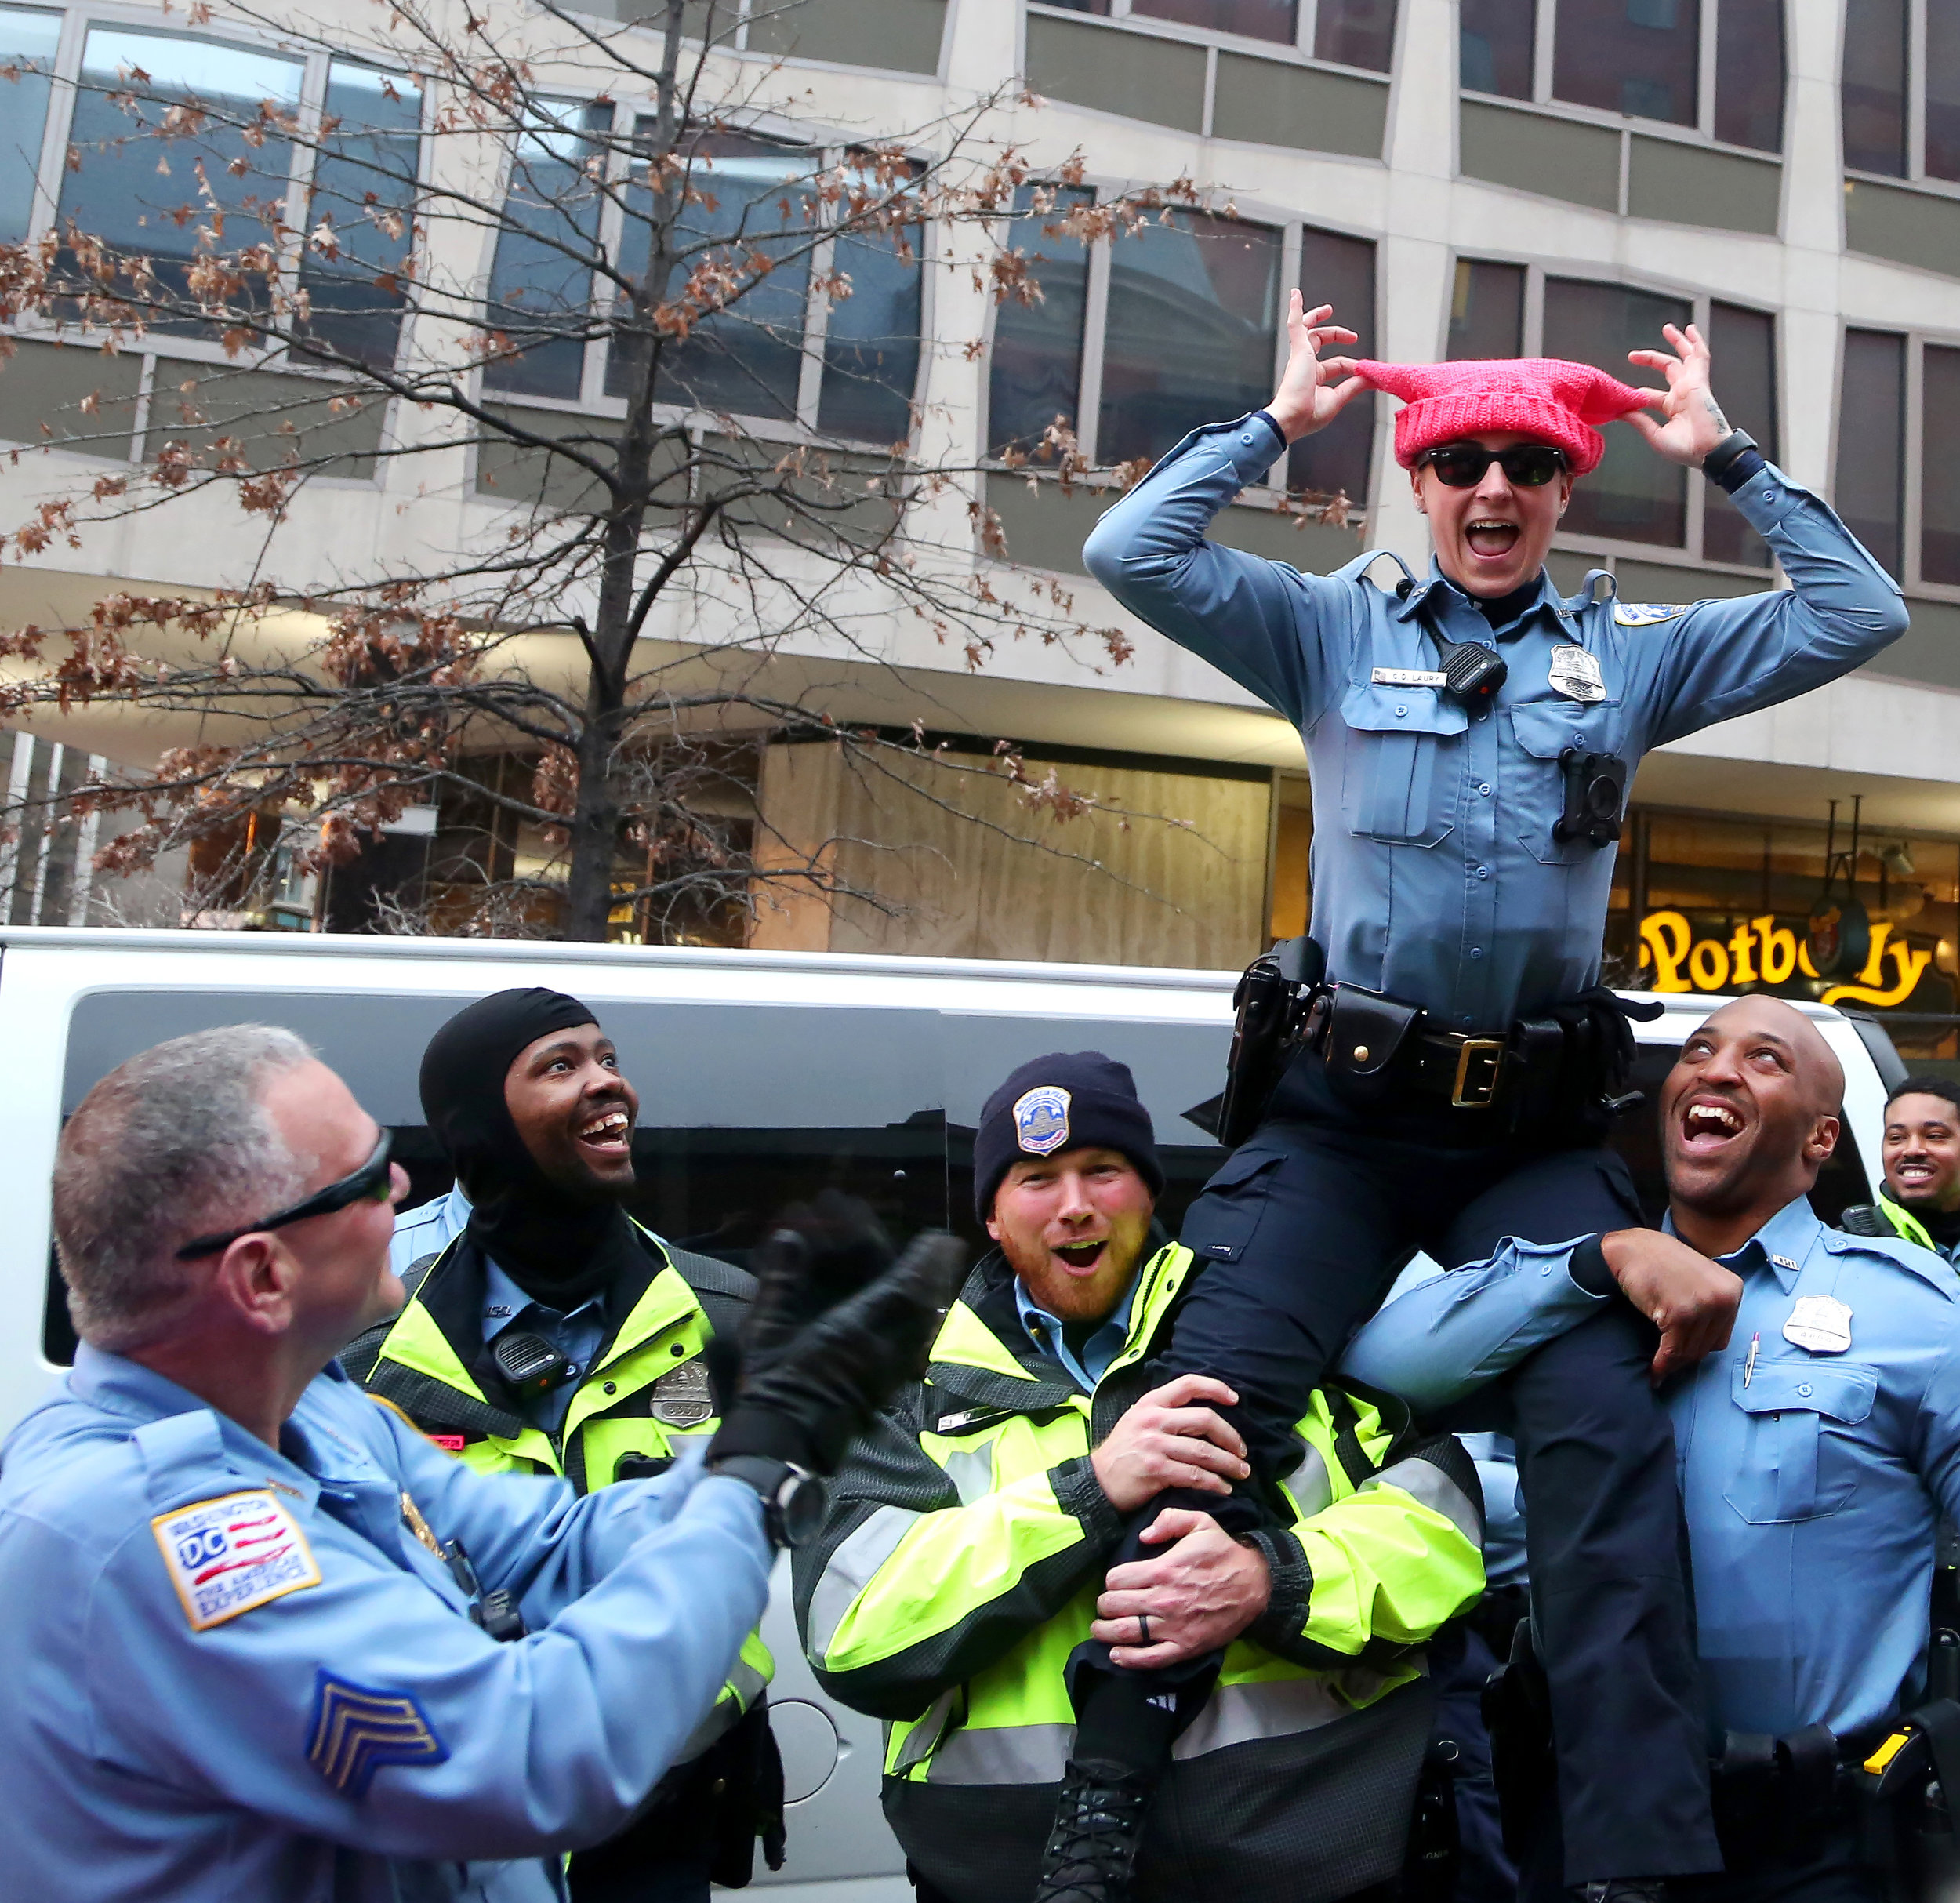 18_womensmarch_caitlinfaw_cops.jpg